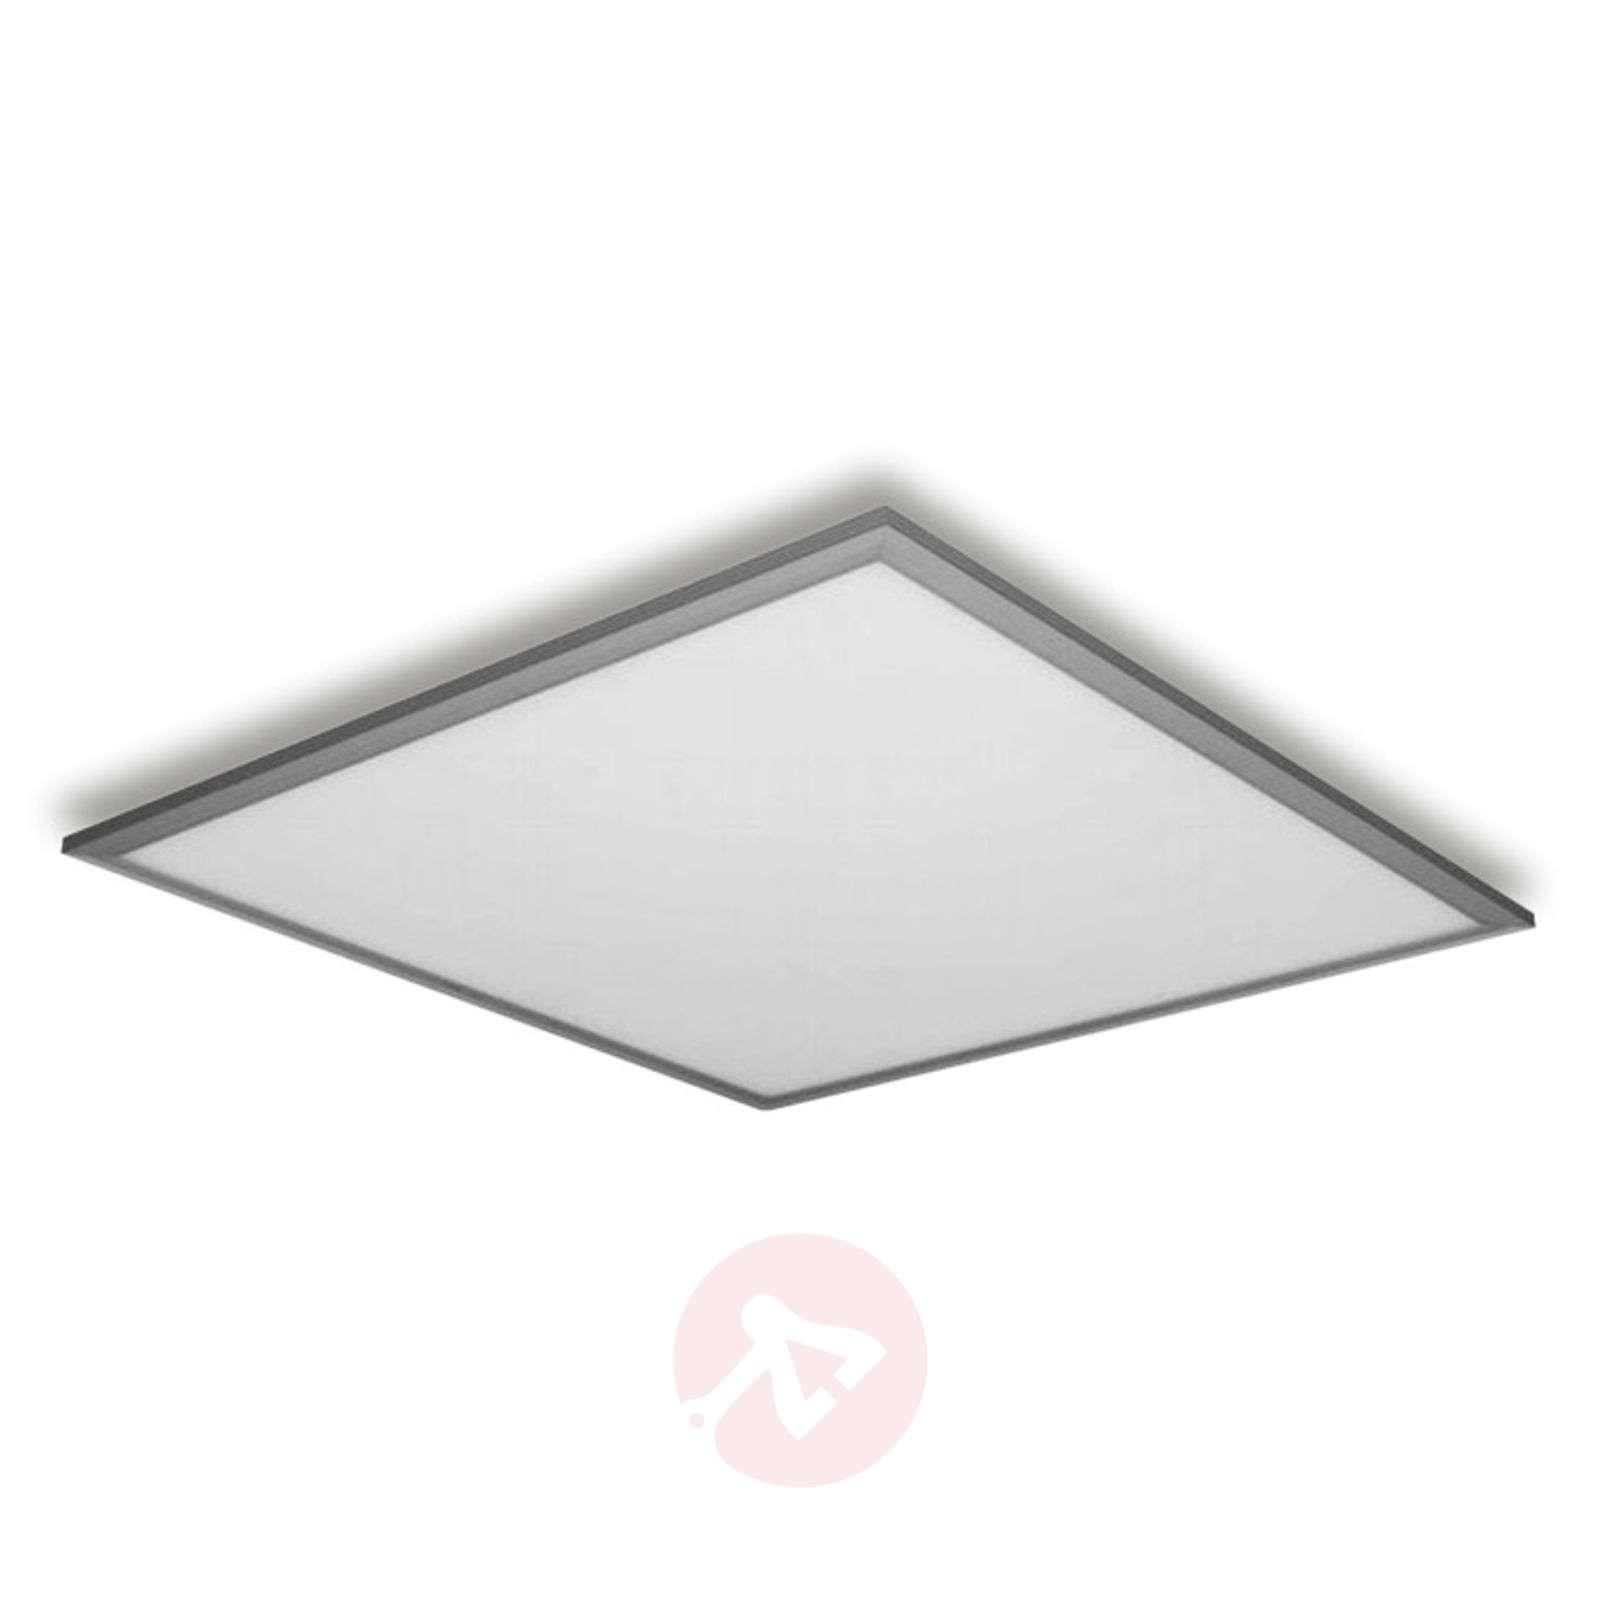 LED-All-in-One-paneeli Edge, valkoinen DALI-3002133-01